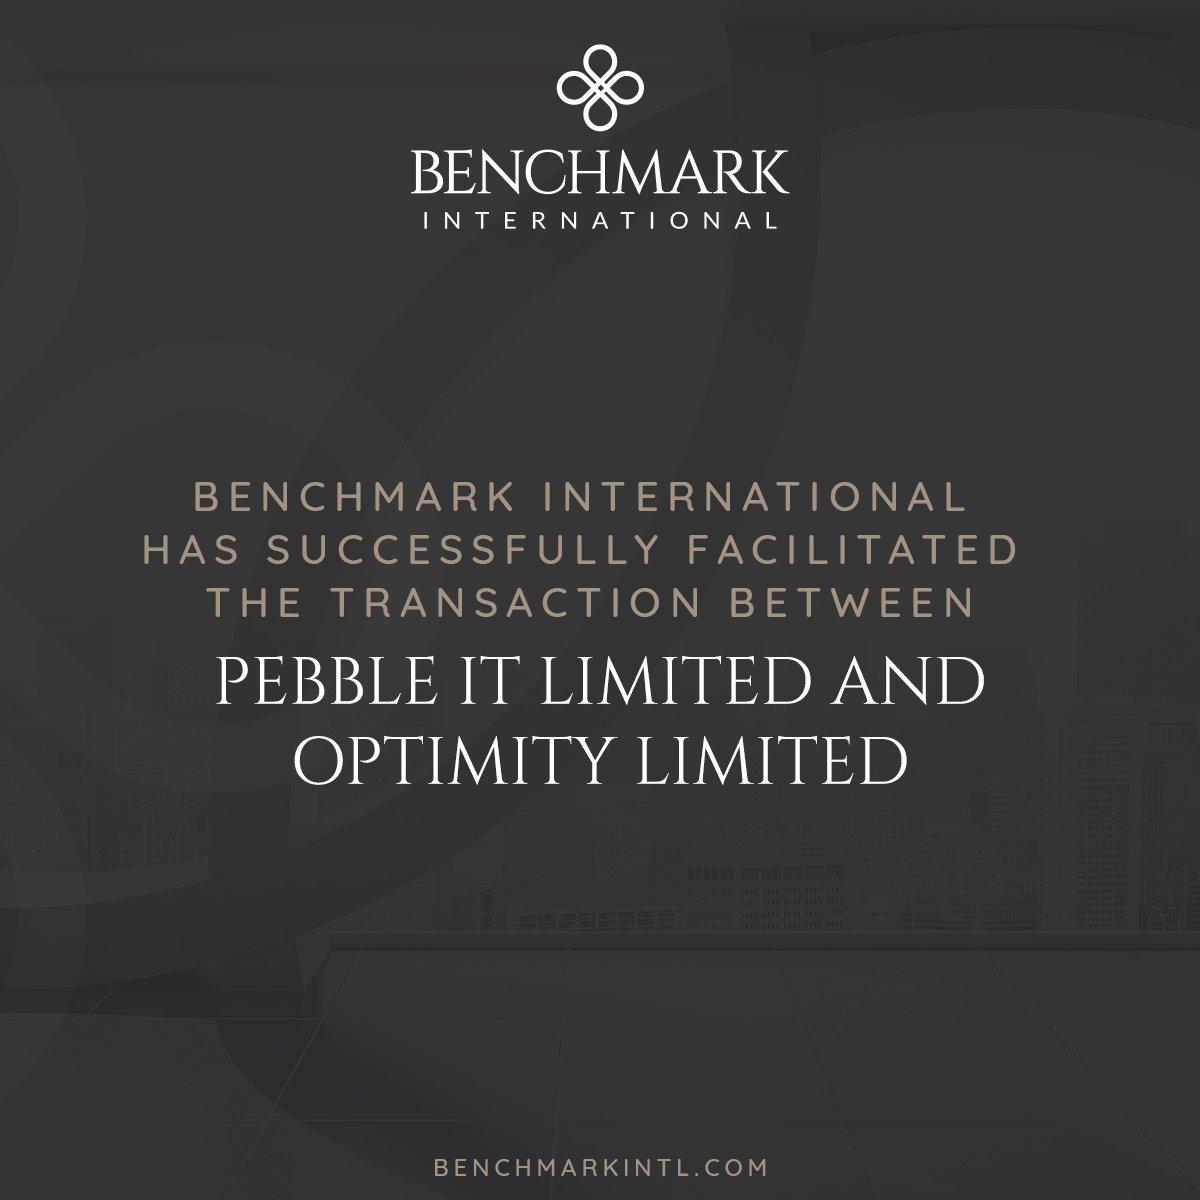 Optimity Acquires Pebble IT